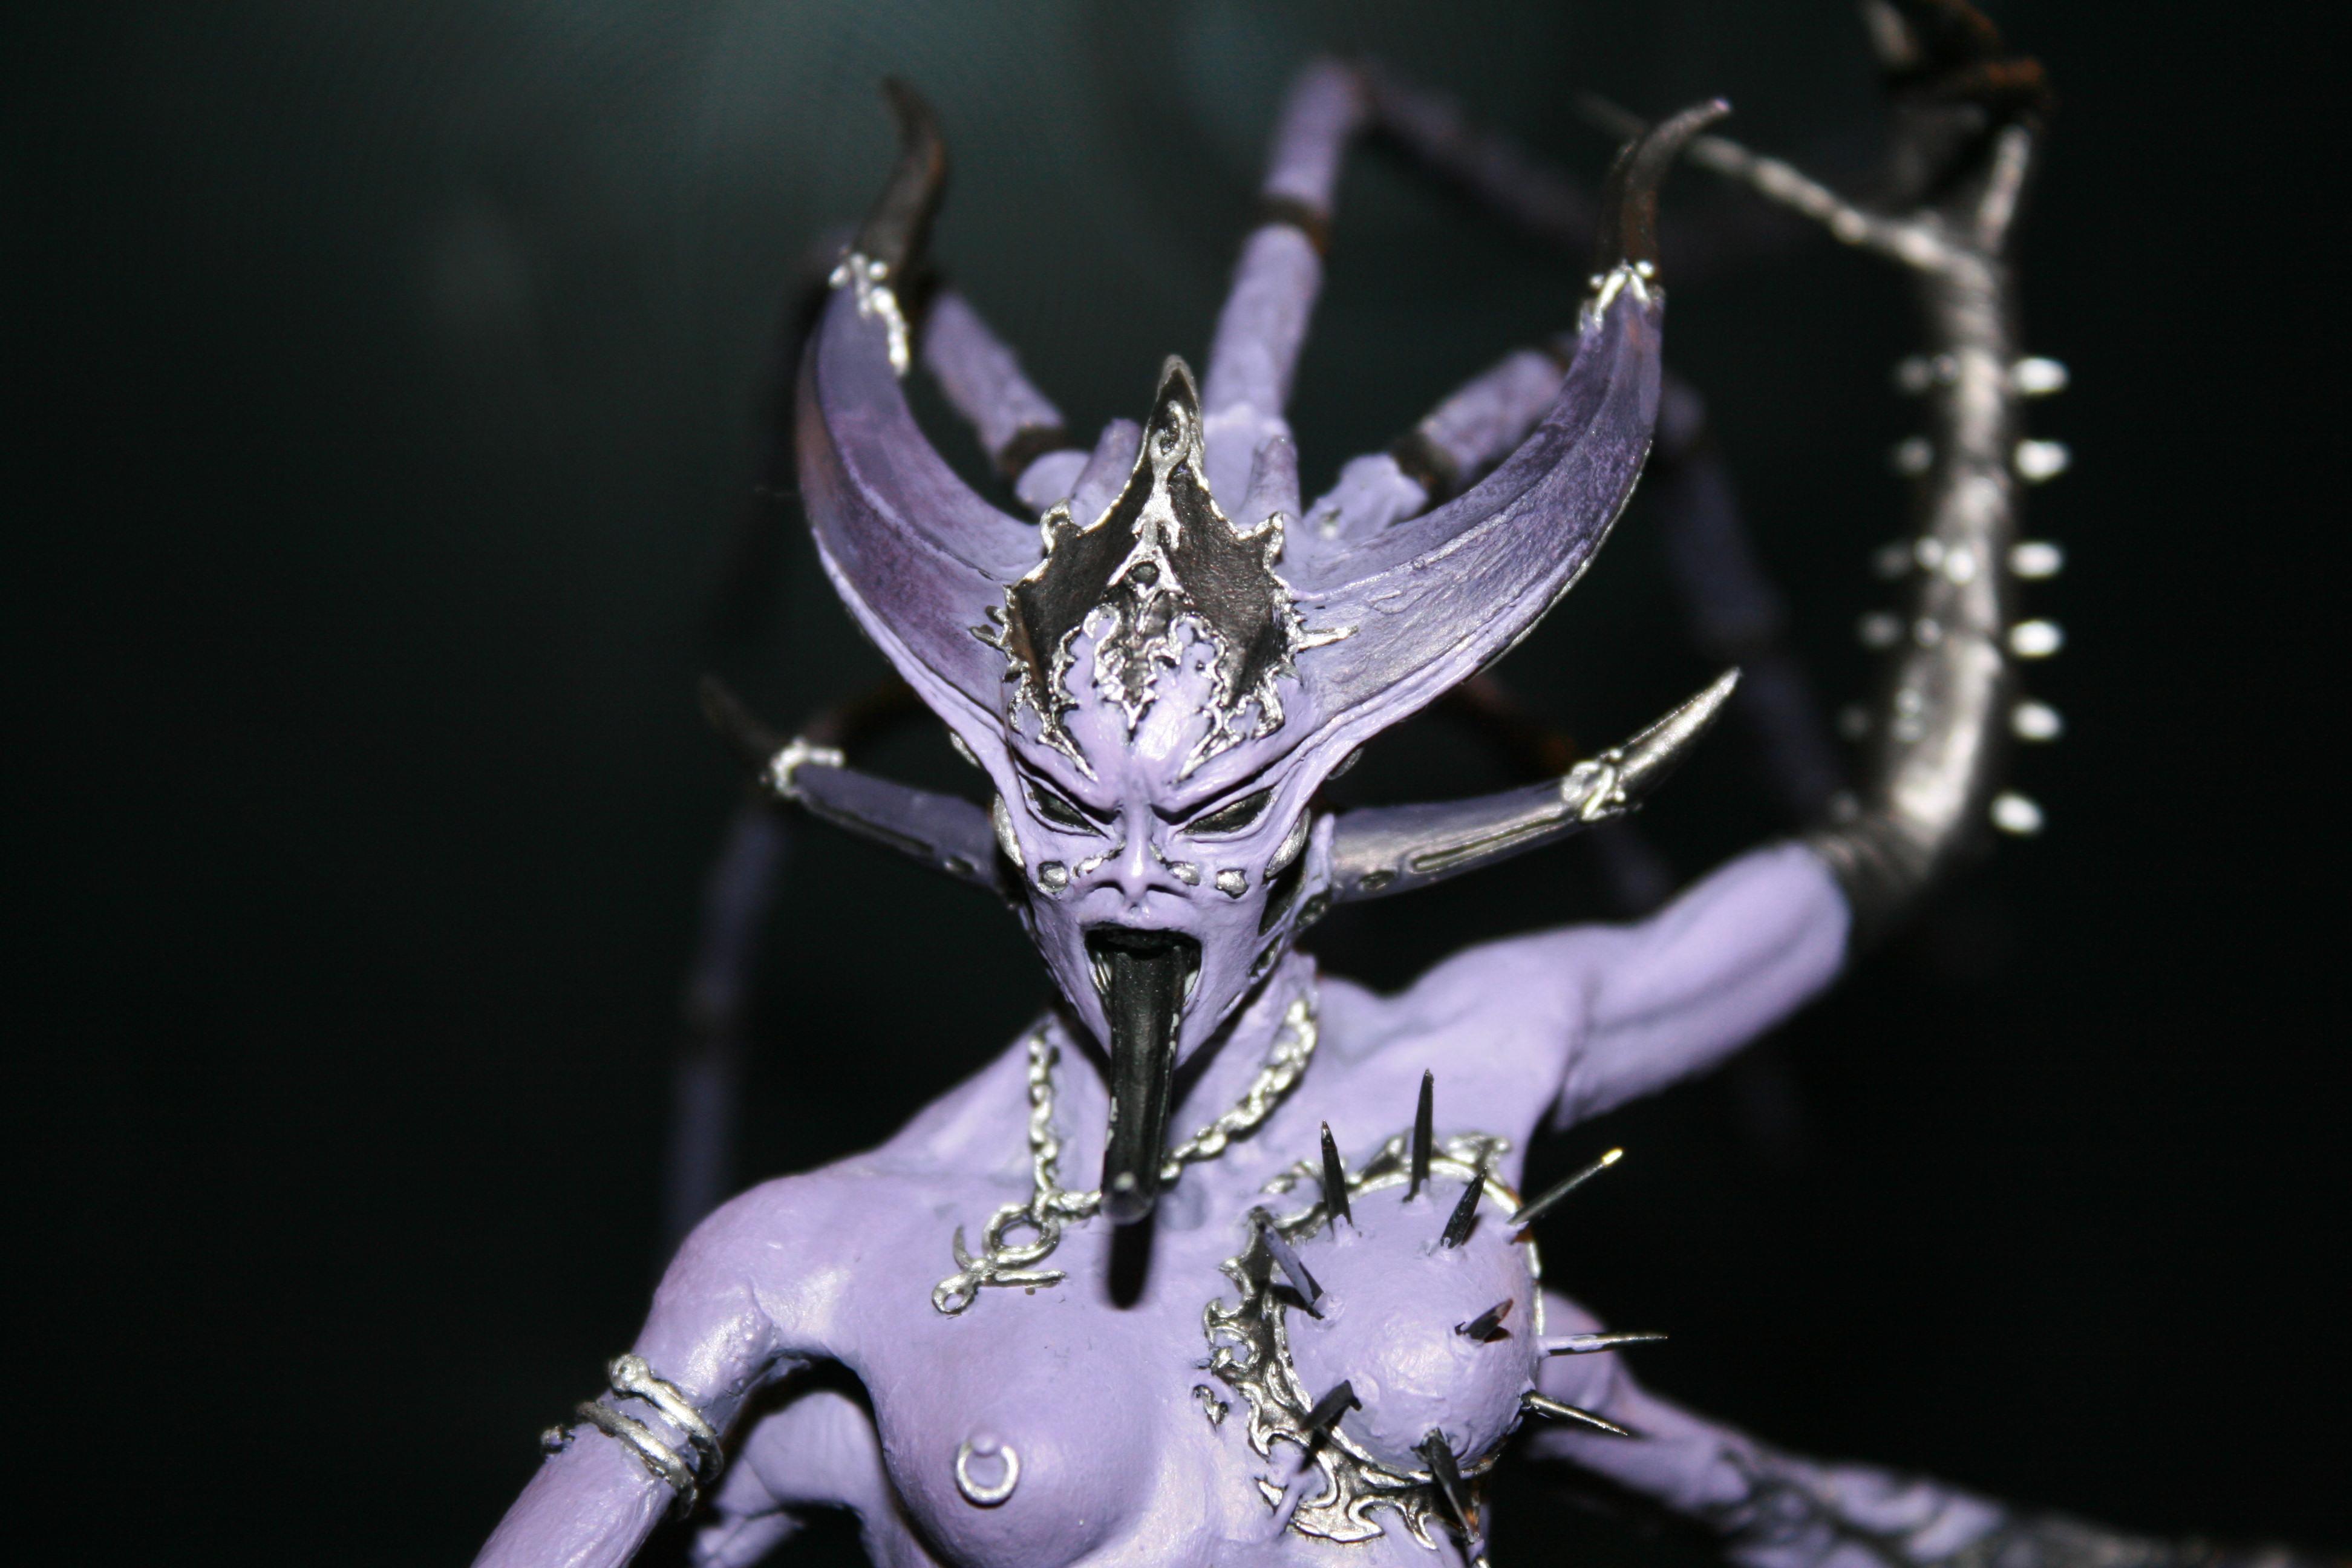 Chaos, Daemons, Forge World, Greater Deamon, Keeper Of Secrets, Slaanesh, Warhammer 40,000